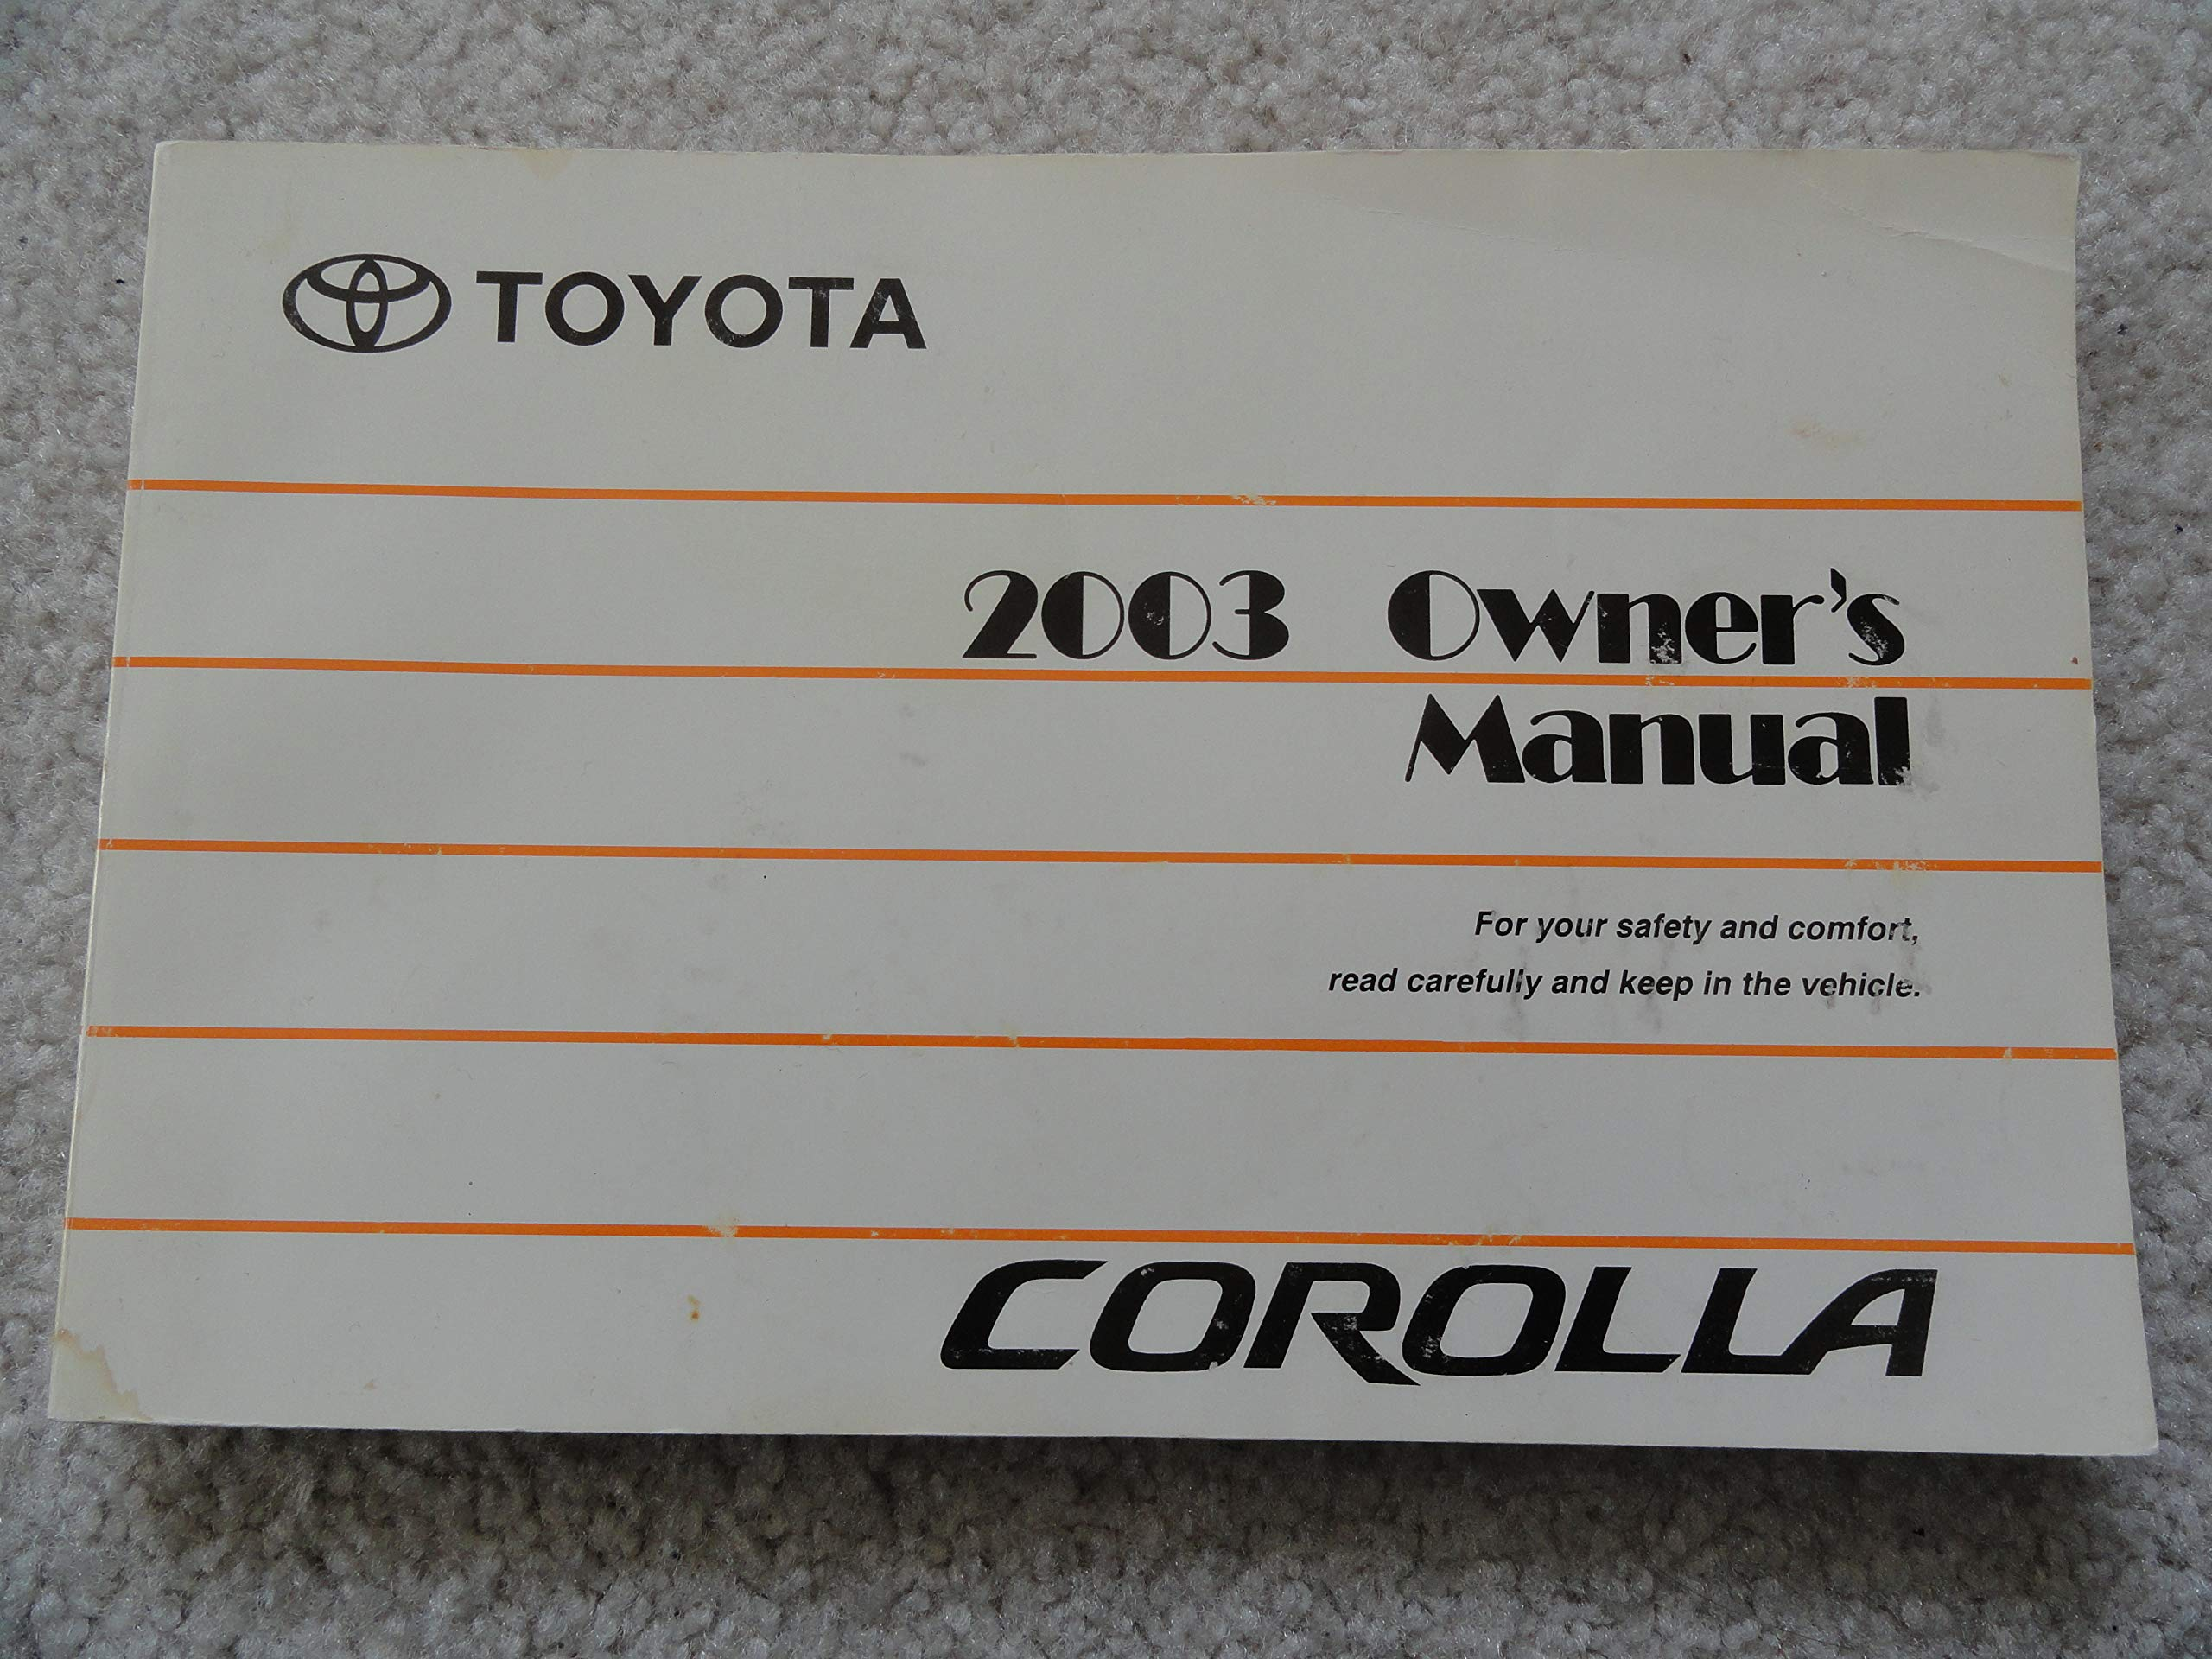 2003 Toyota Corolla Owners Manual Toyota Amazon Com Books